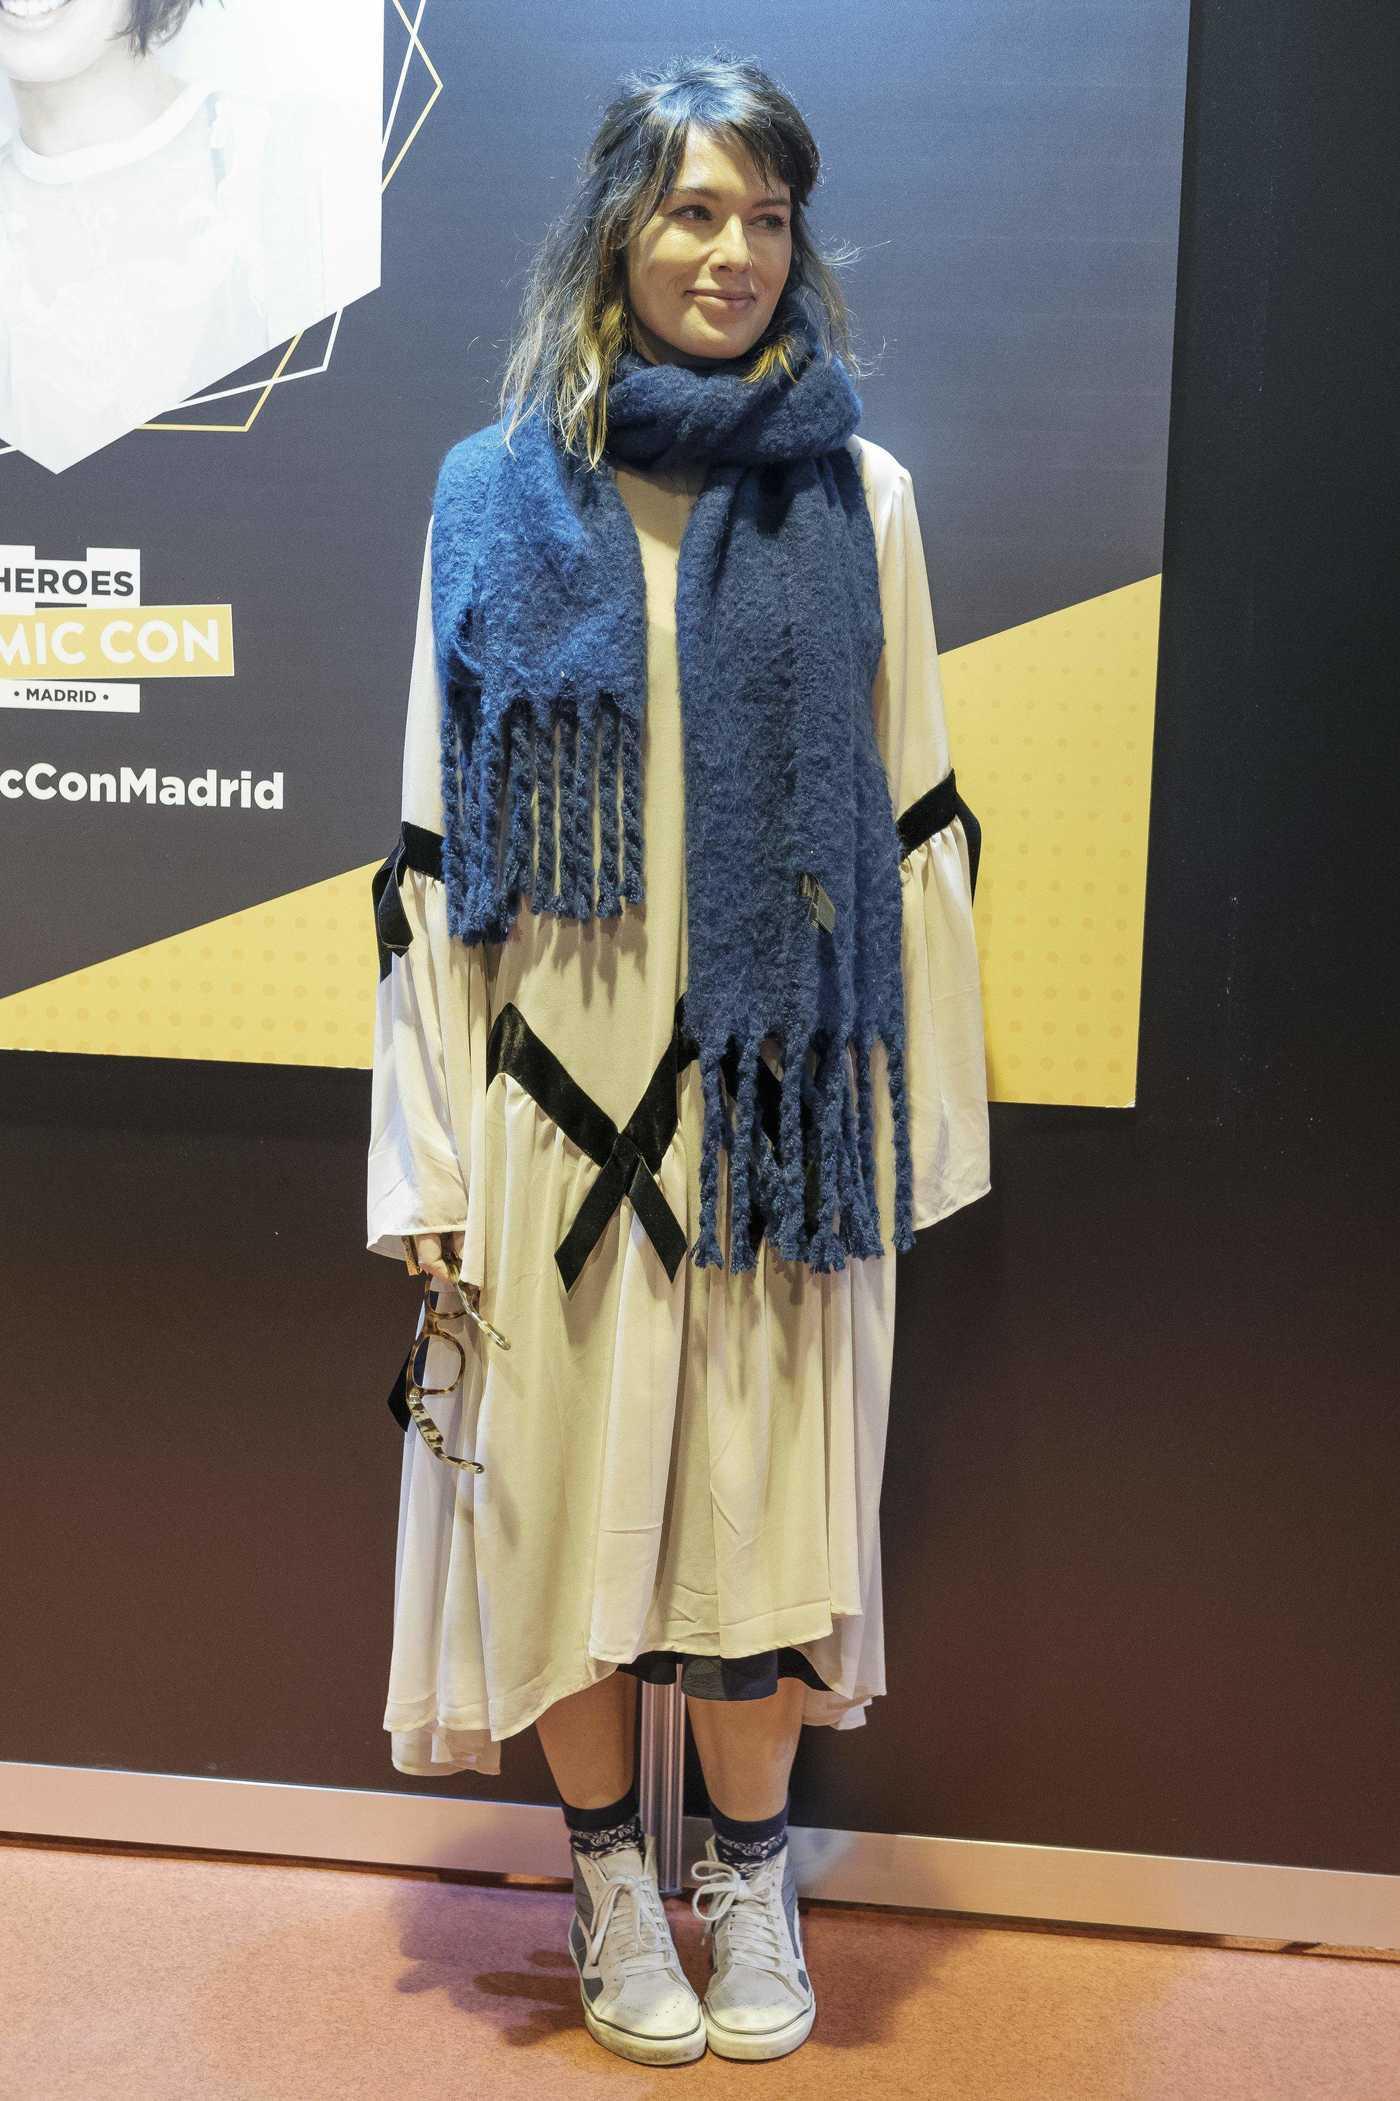 Lena Headey Attends 2017 Heroes Comic Con in Madrid 11/11/2017